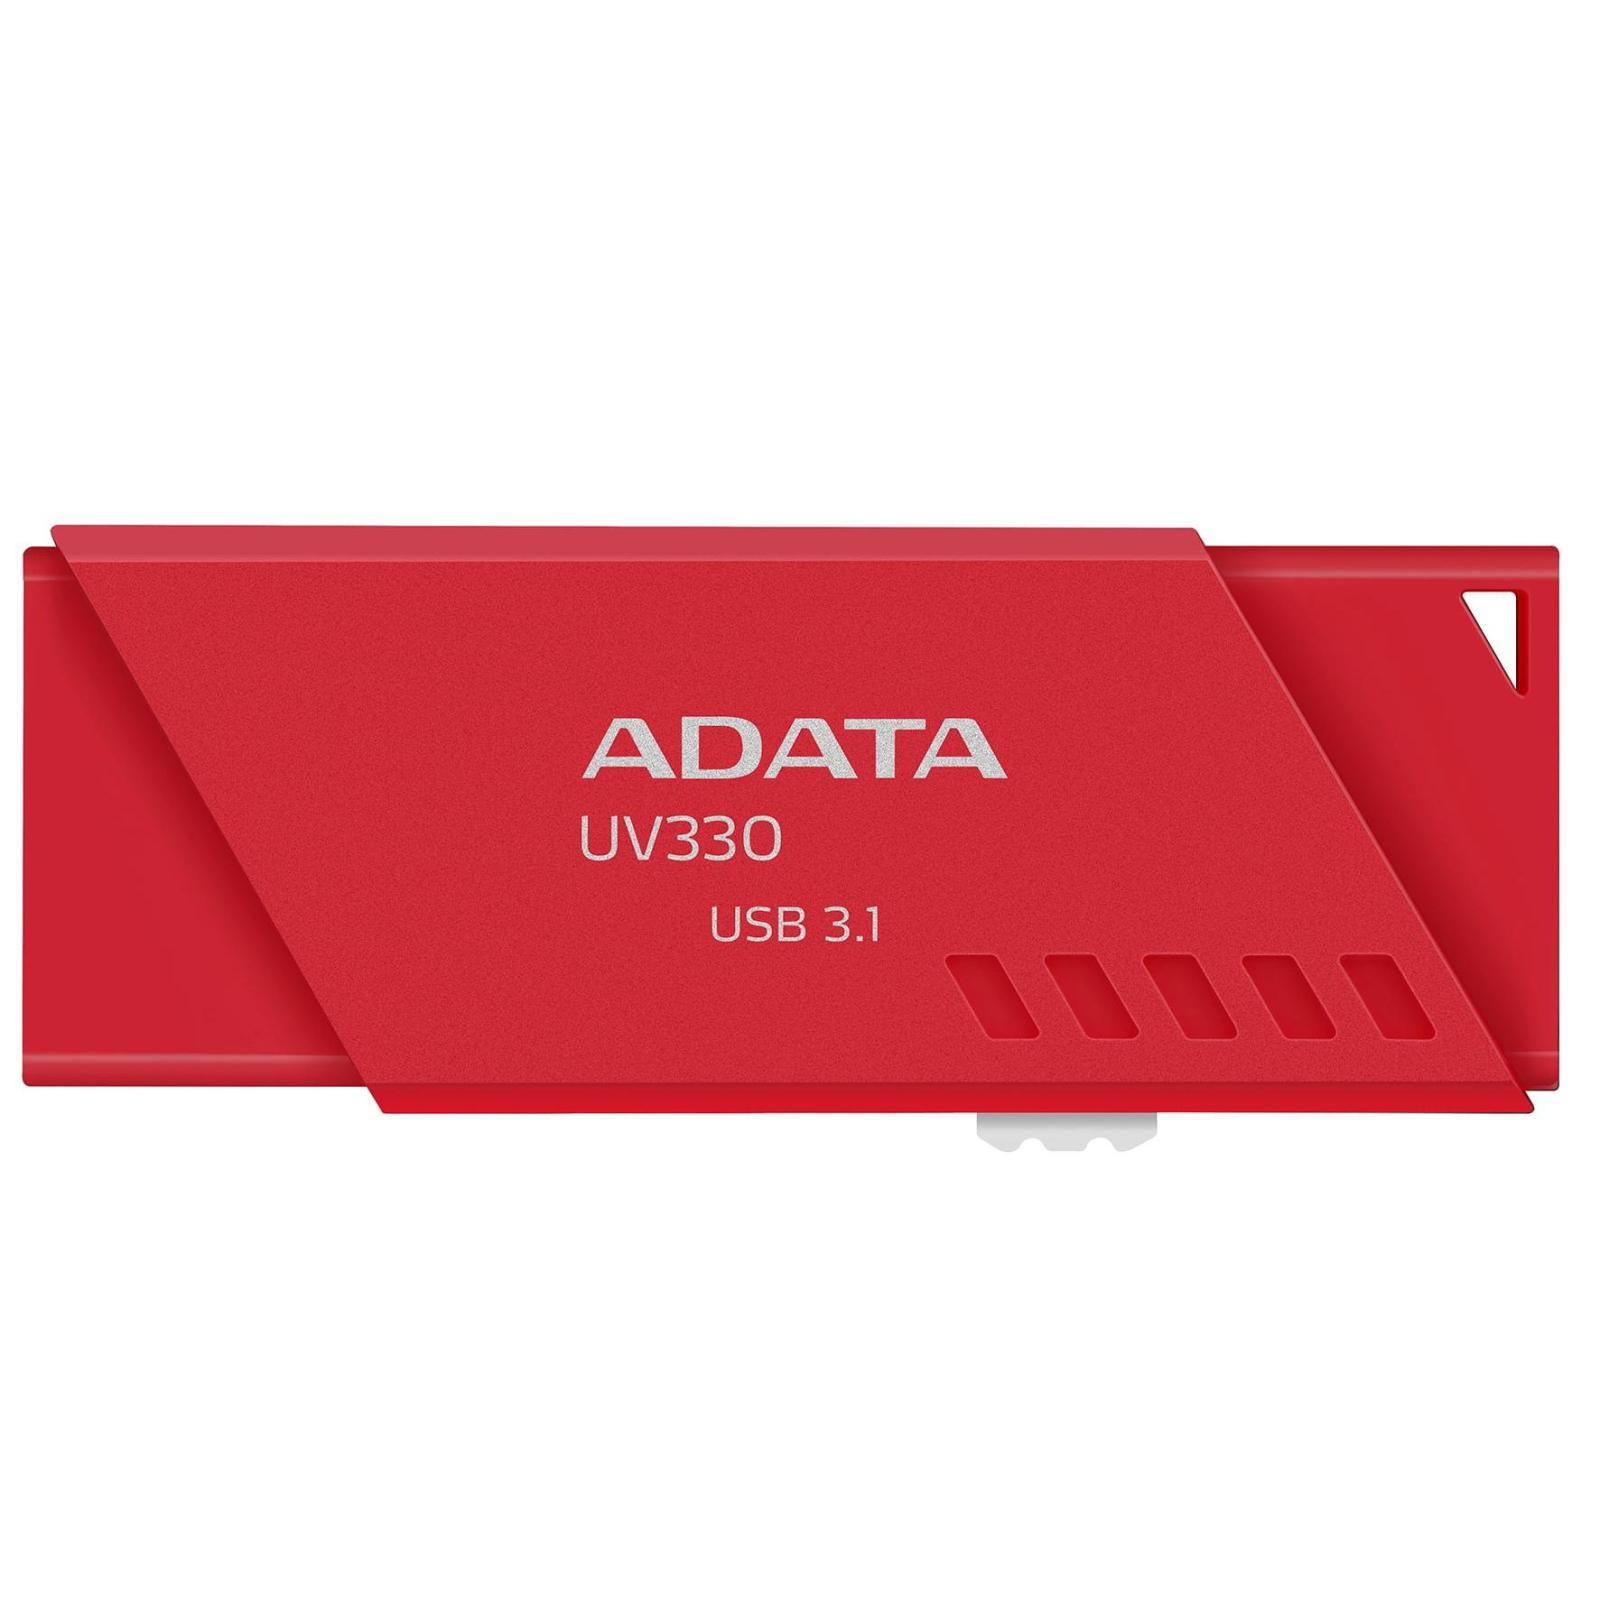 USB флеш накопитель ADATA 32GB UV330 Black USB 3.1 (AUV330-32G-RBK)